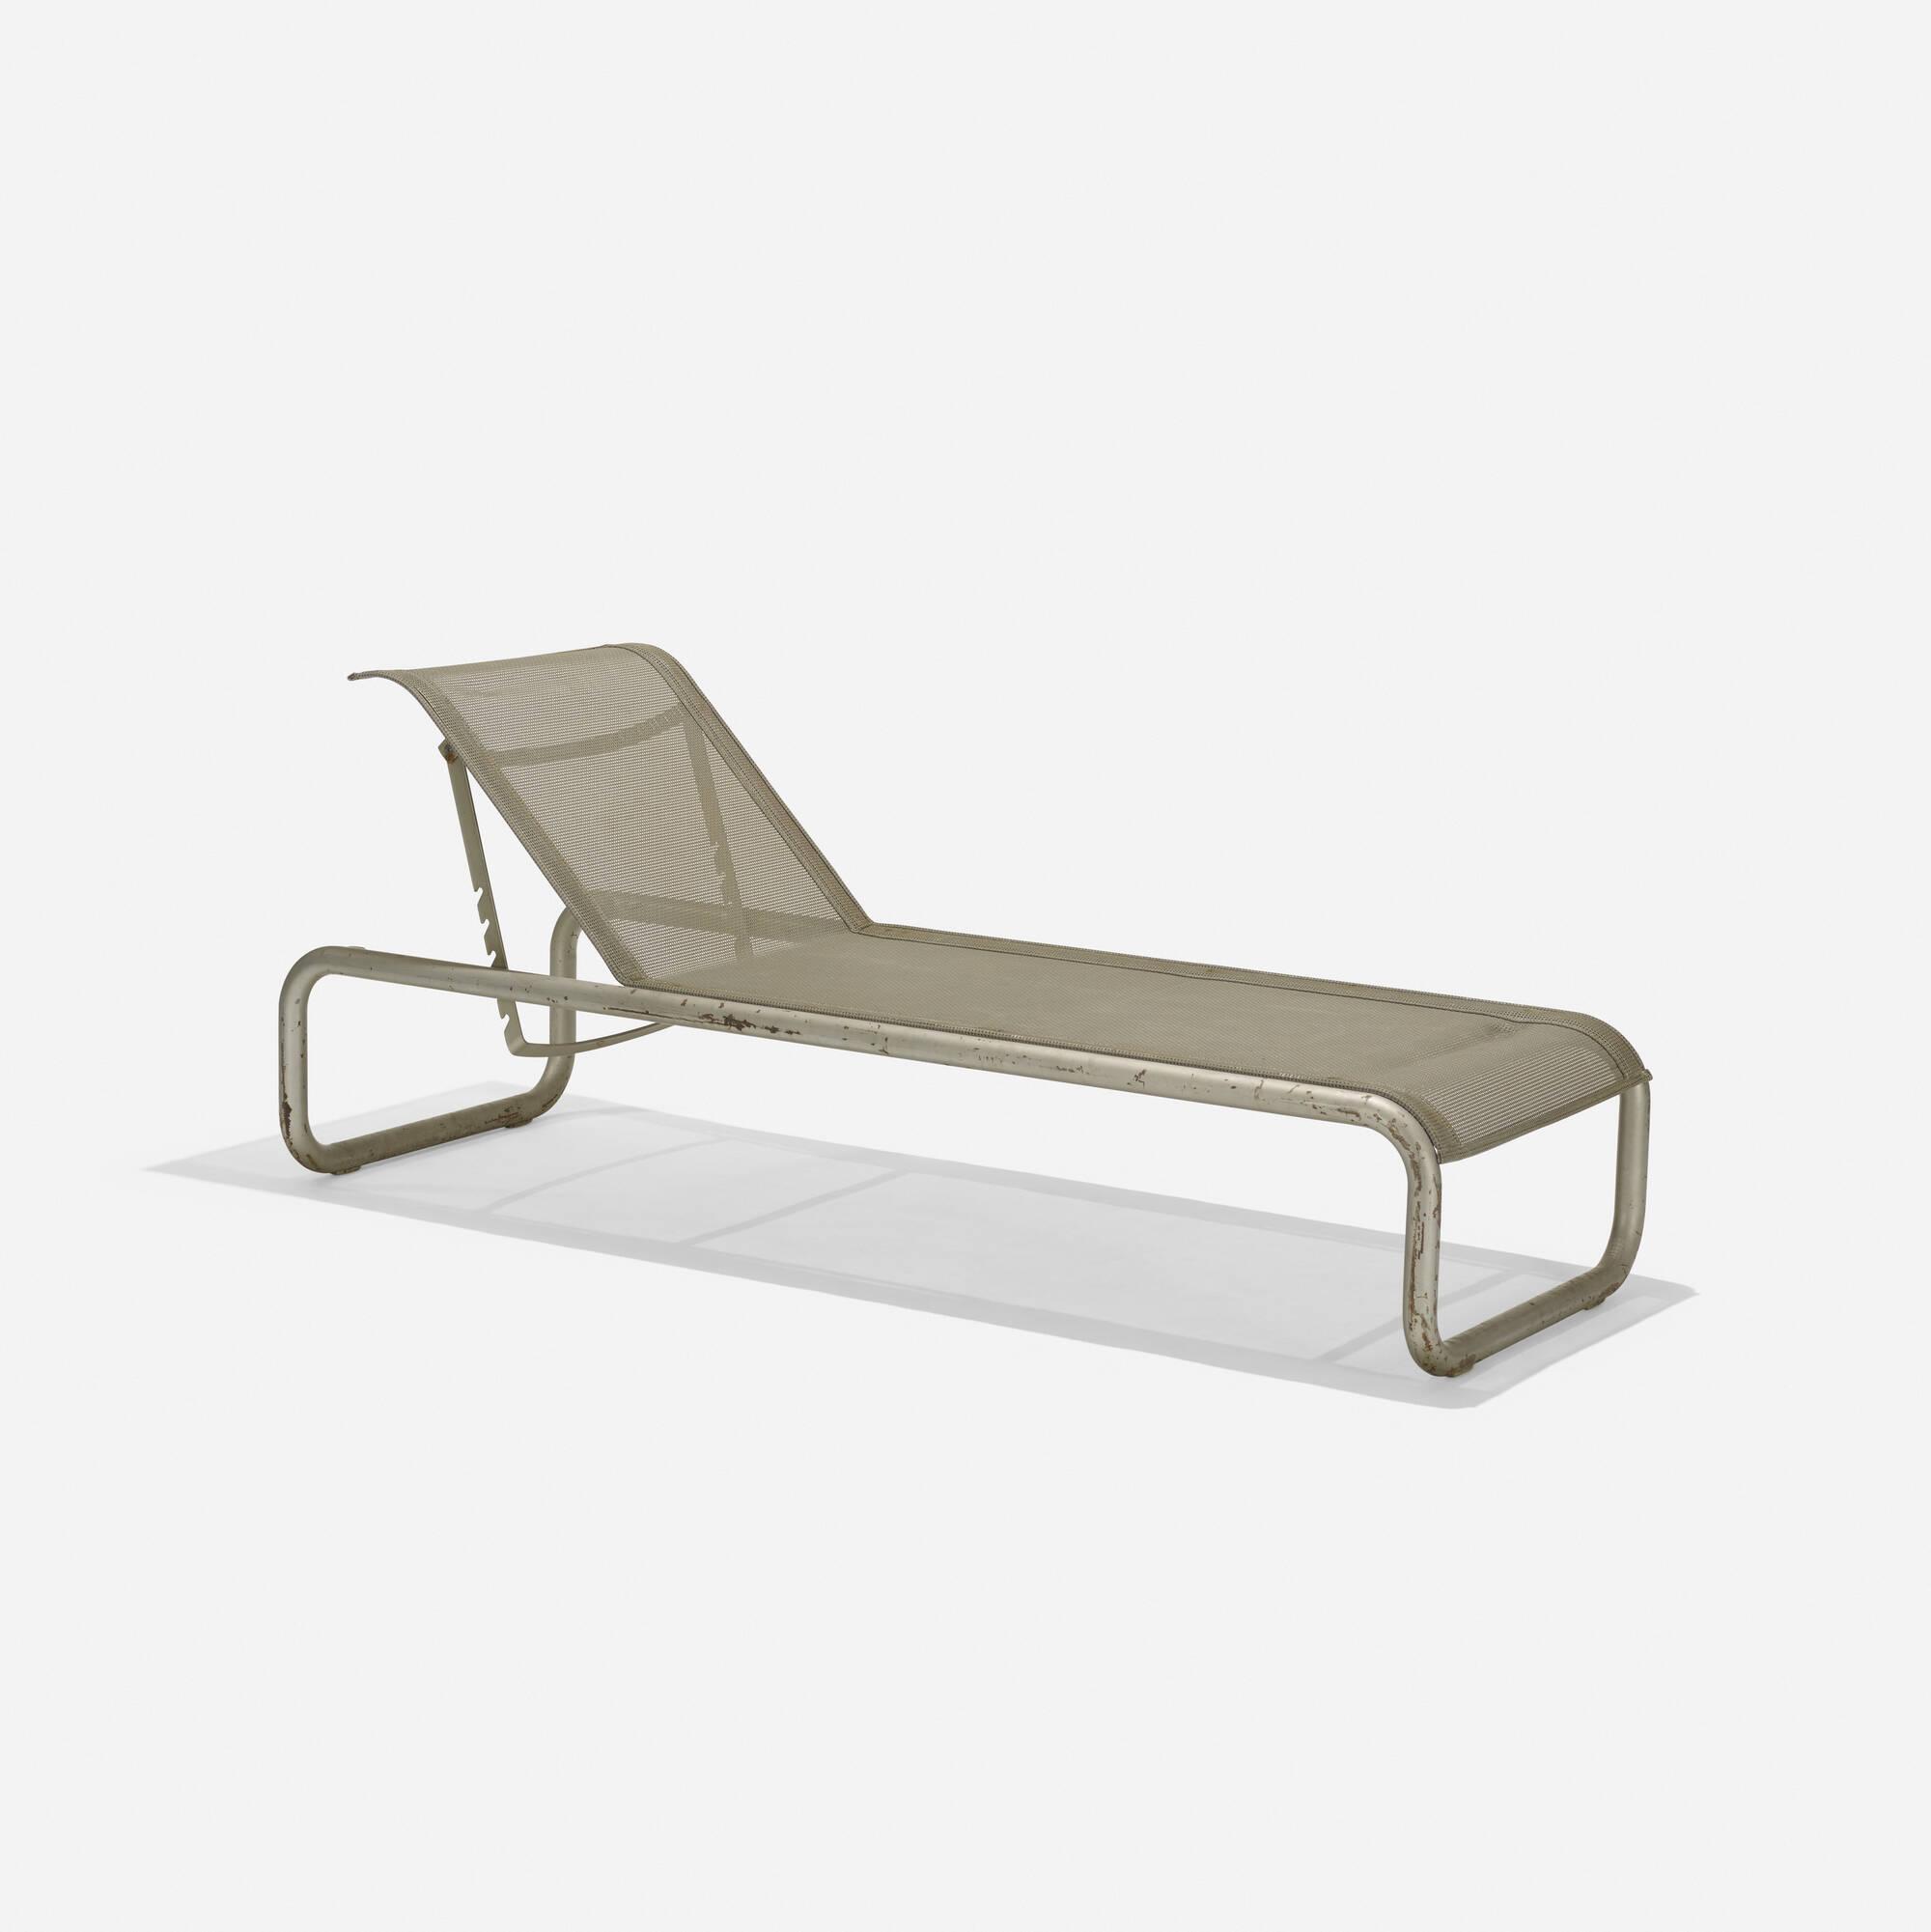 5a614bfa7b1c 135  Richard Schultz   Prototype adjustable chaise lounge (1 of 3)